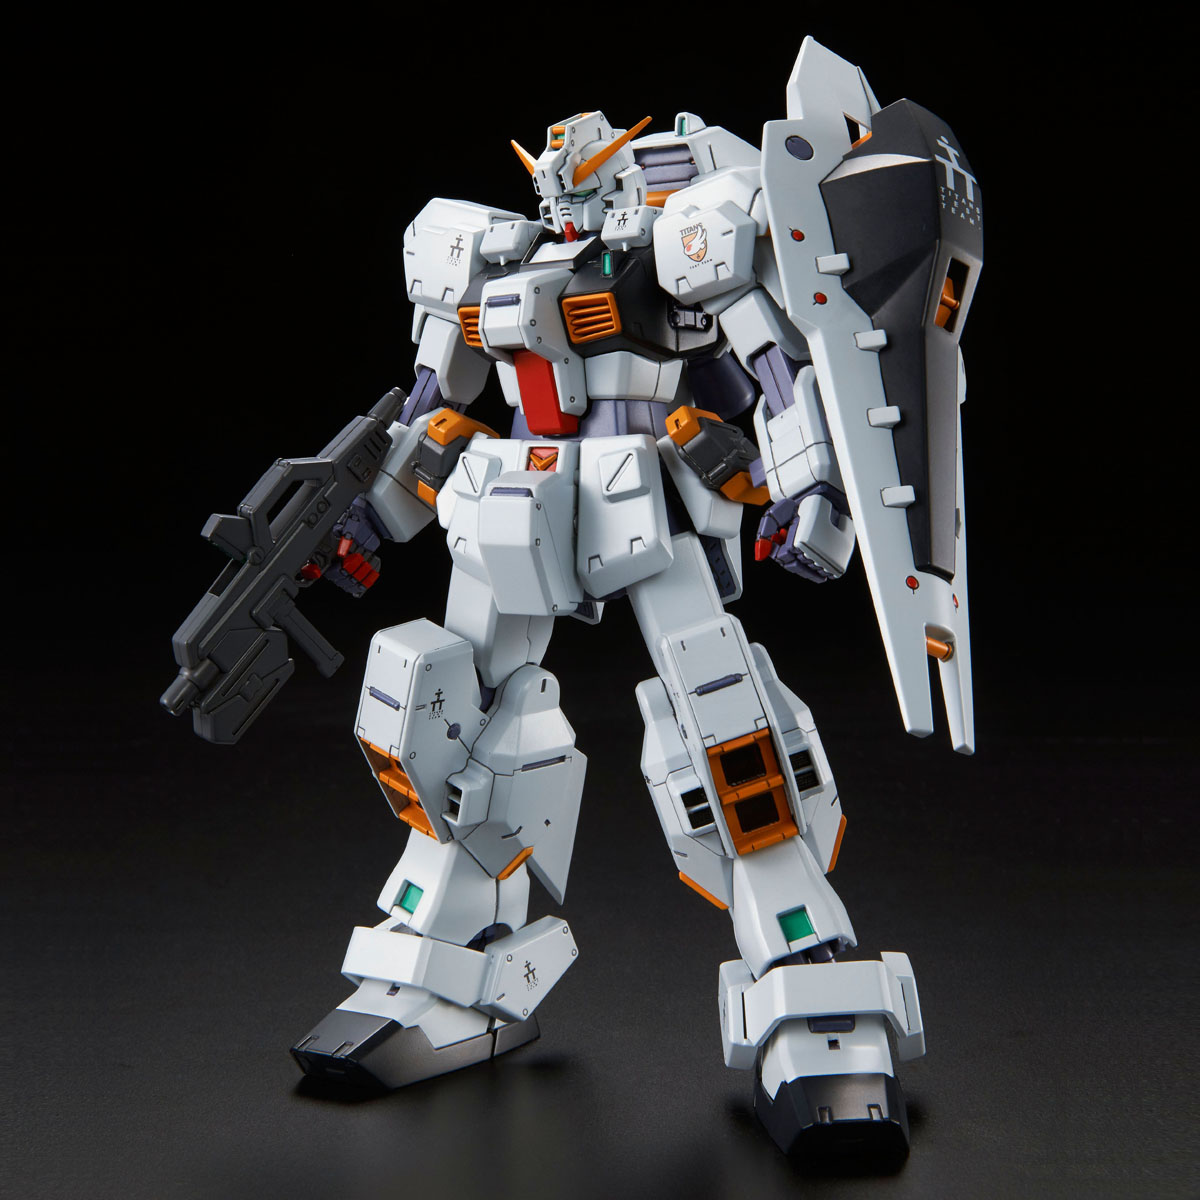 54281MG 1/100 RX-121-1 ガンダムTR-1[ヘイズル改] [Gundam TR-1 [Hazel Custom]]